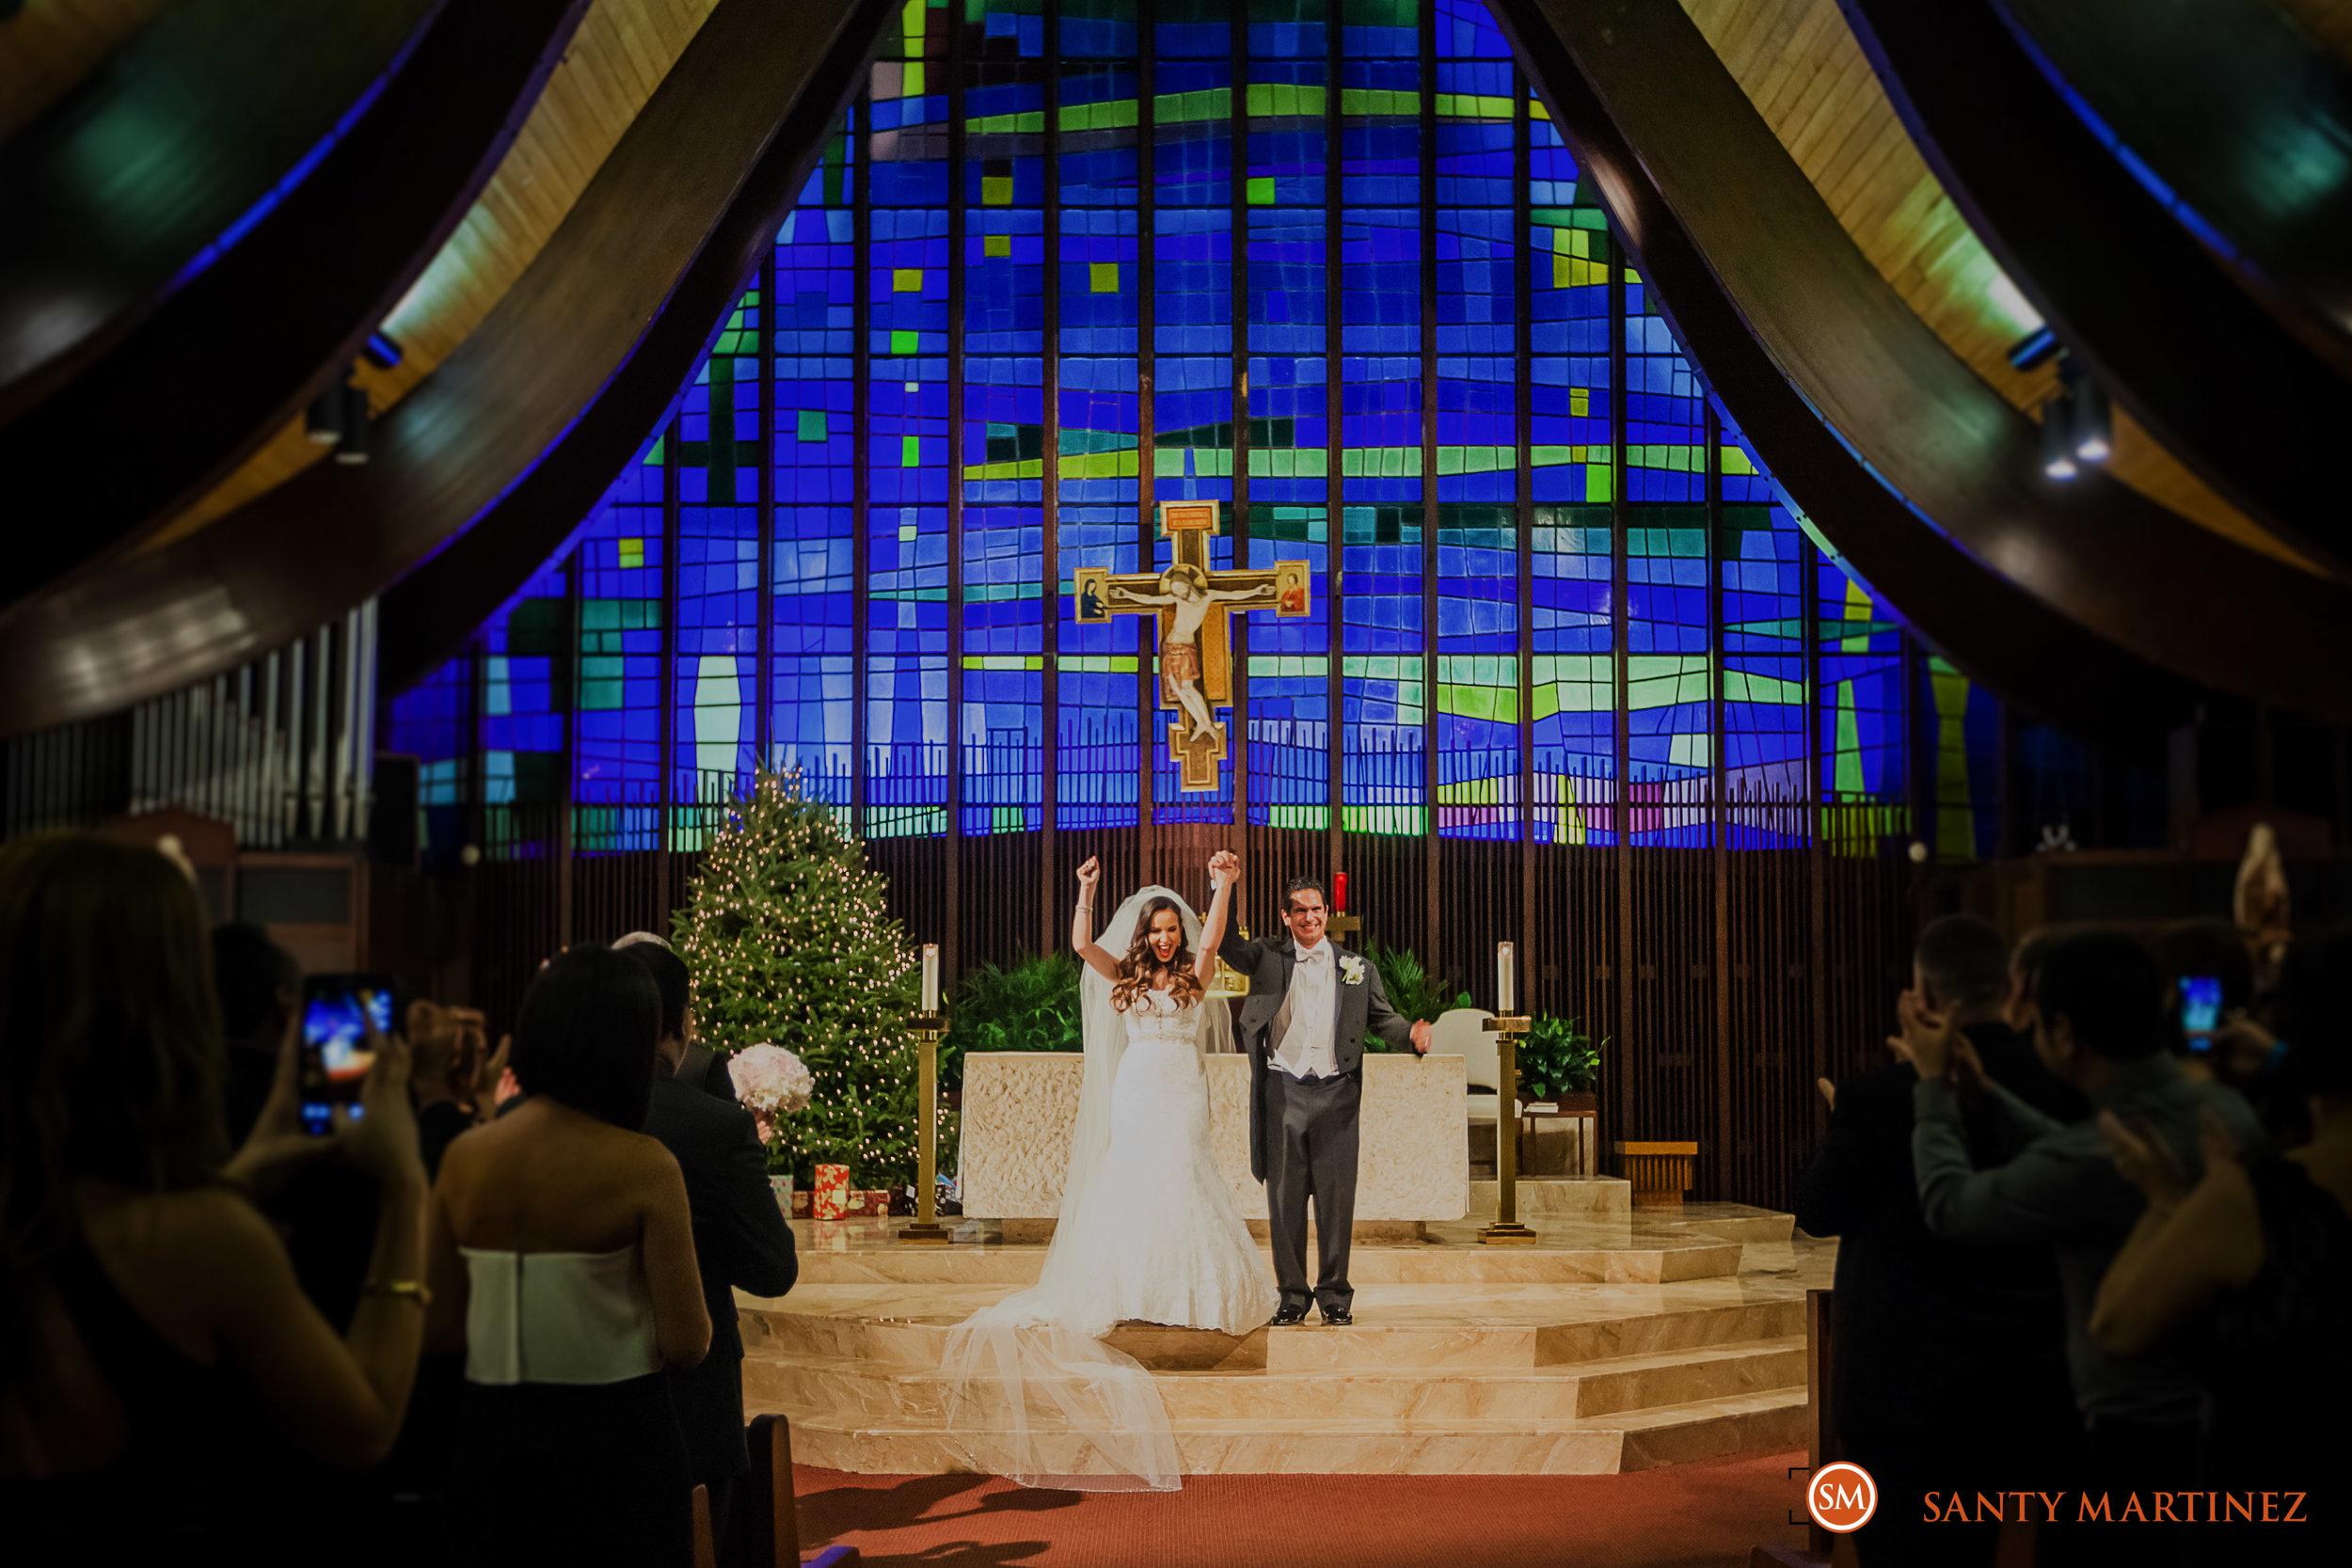 Miami Wedding Photographer - Santy Martinez-34.jpg